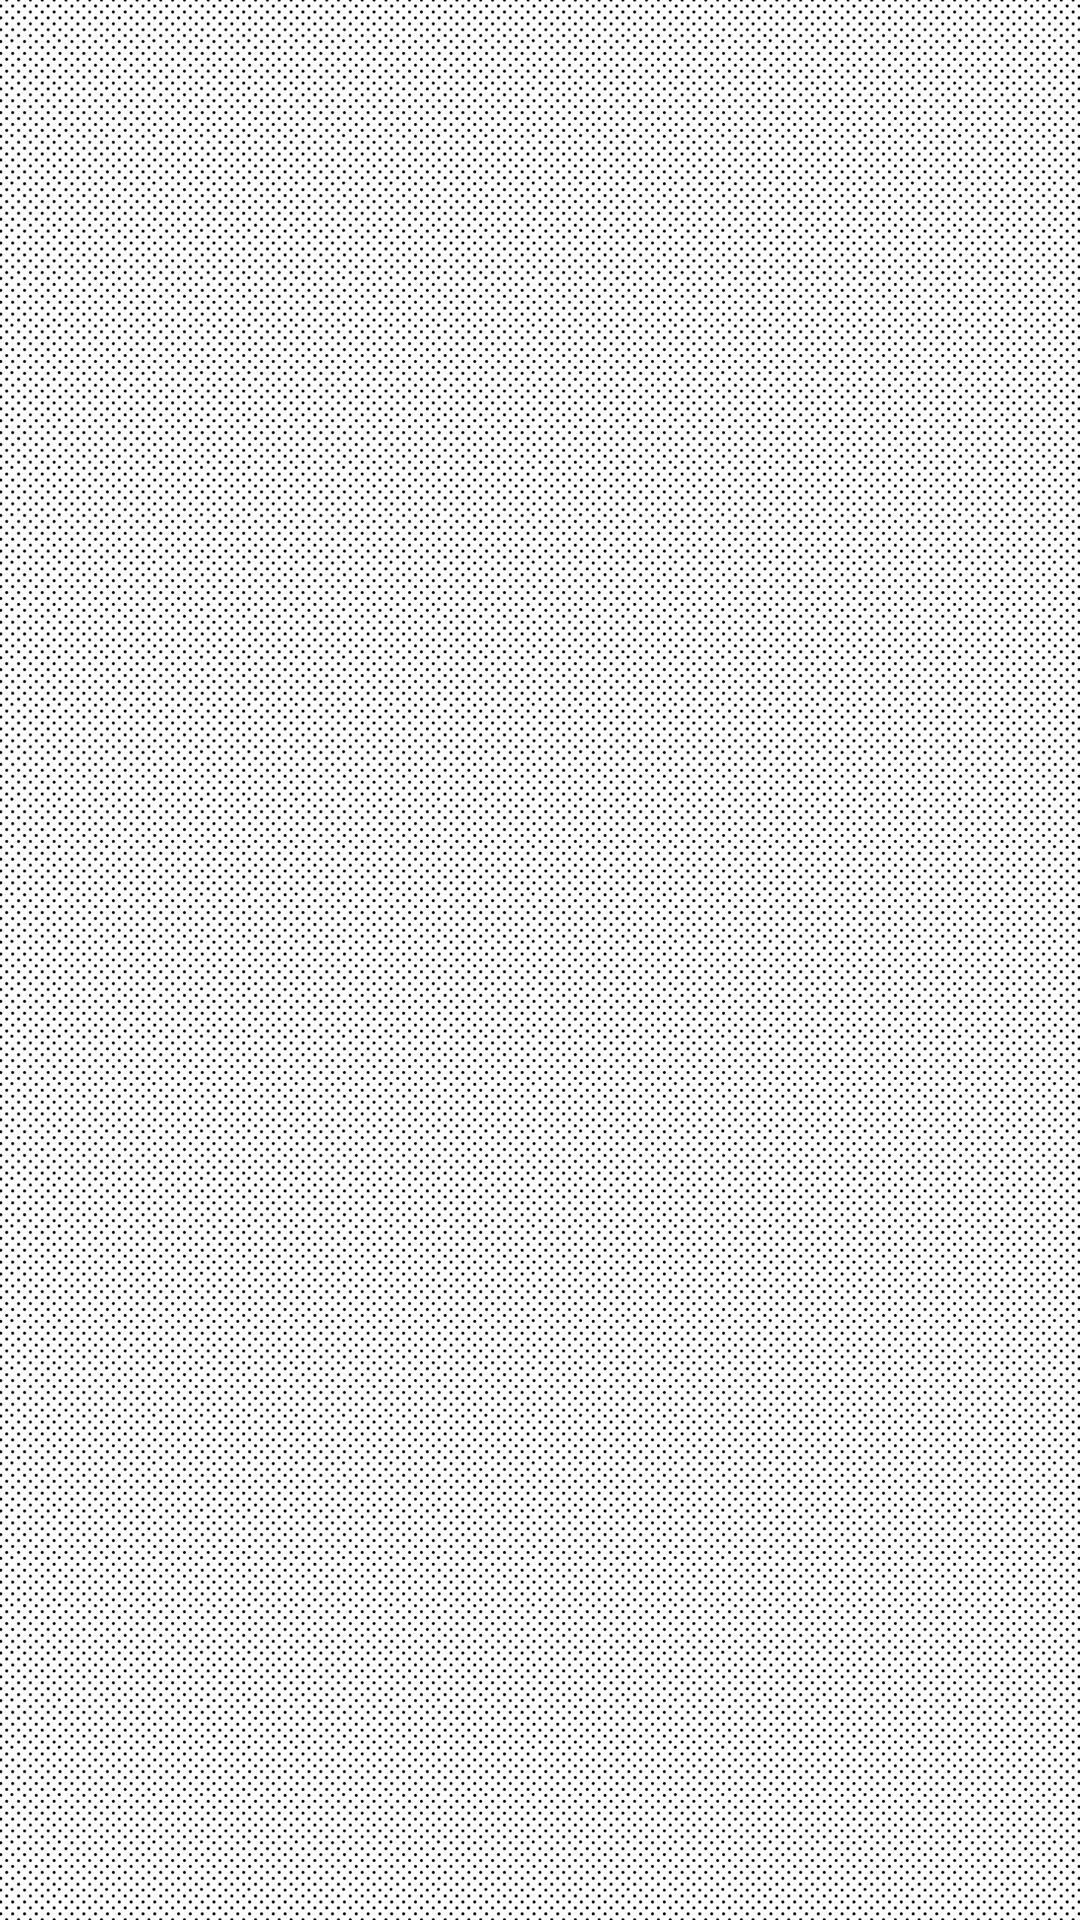 Unduh 82+ Wallpaper Iphone Putih Hd Gambar Paling Keren